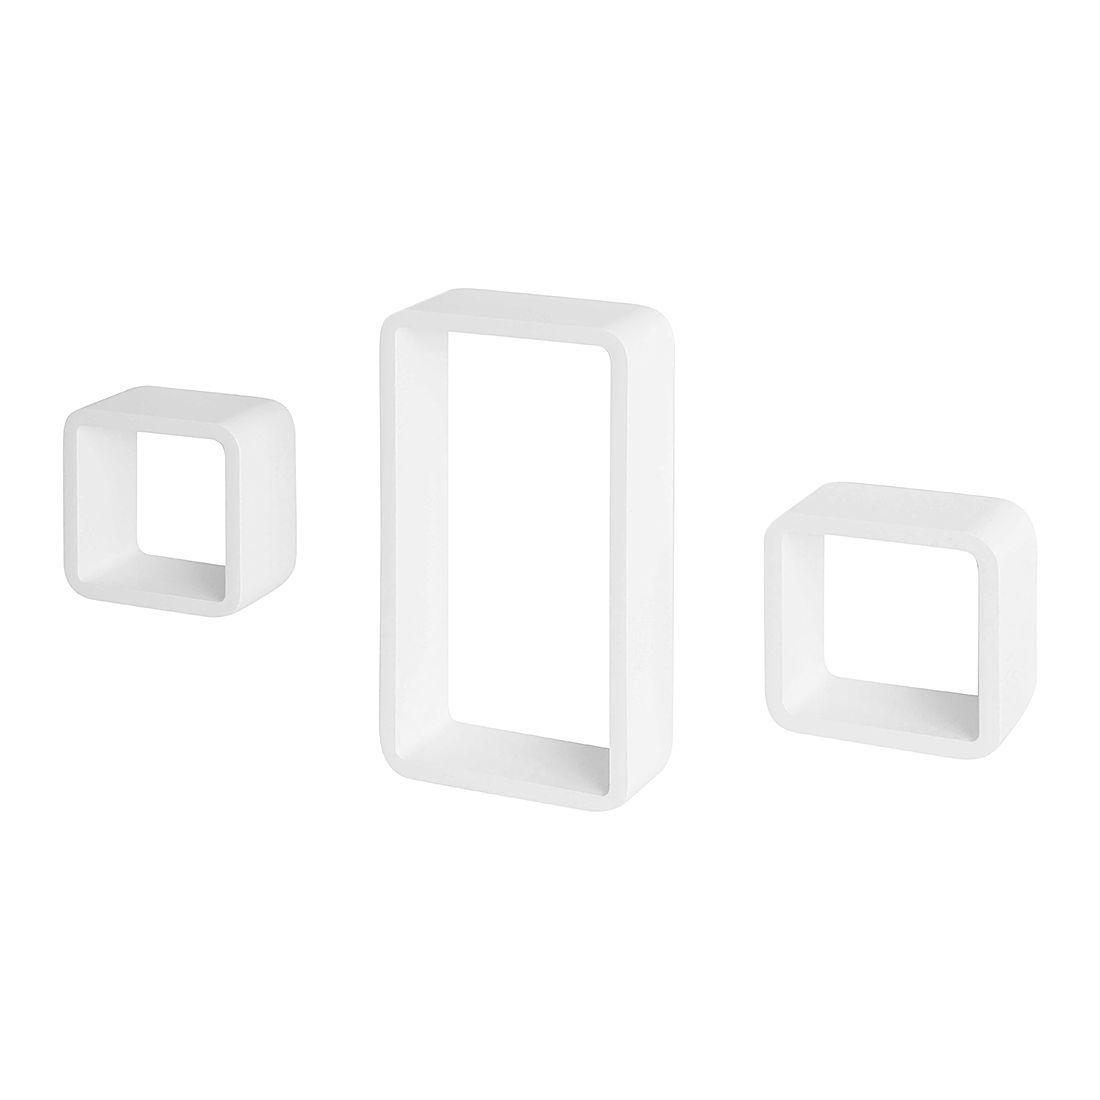 Wandregal-Set Anoka (3er-Set) - Hochglanz Weiß, Fredriks Jetzt bestellen unter: https://moebel.ladendirekt.de/wohnzimmer/regale/?uid=be48151f-999b-55ff-a1b6-5ceaf7c5eb68&utm_source=pinterest&utm_medium=pin&utm_campaign=boards #möbel #fredriks #wohnzimmer #regale